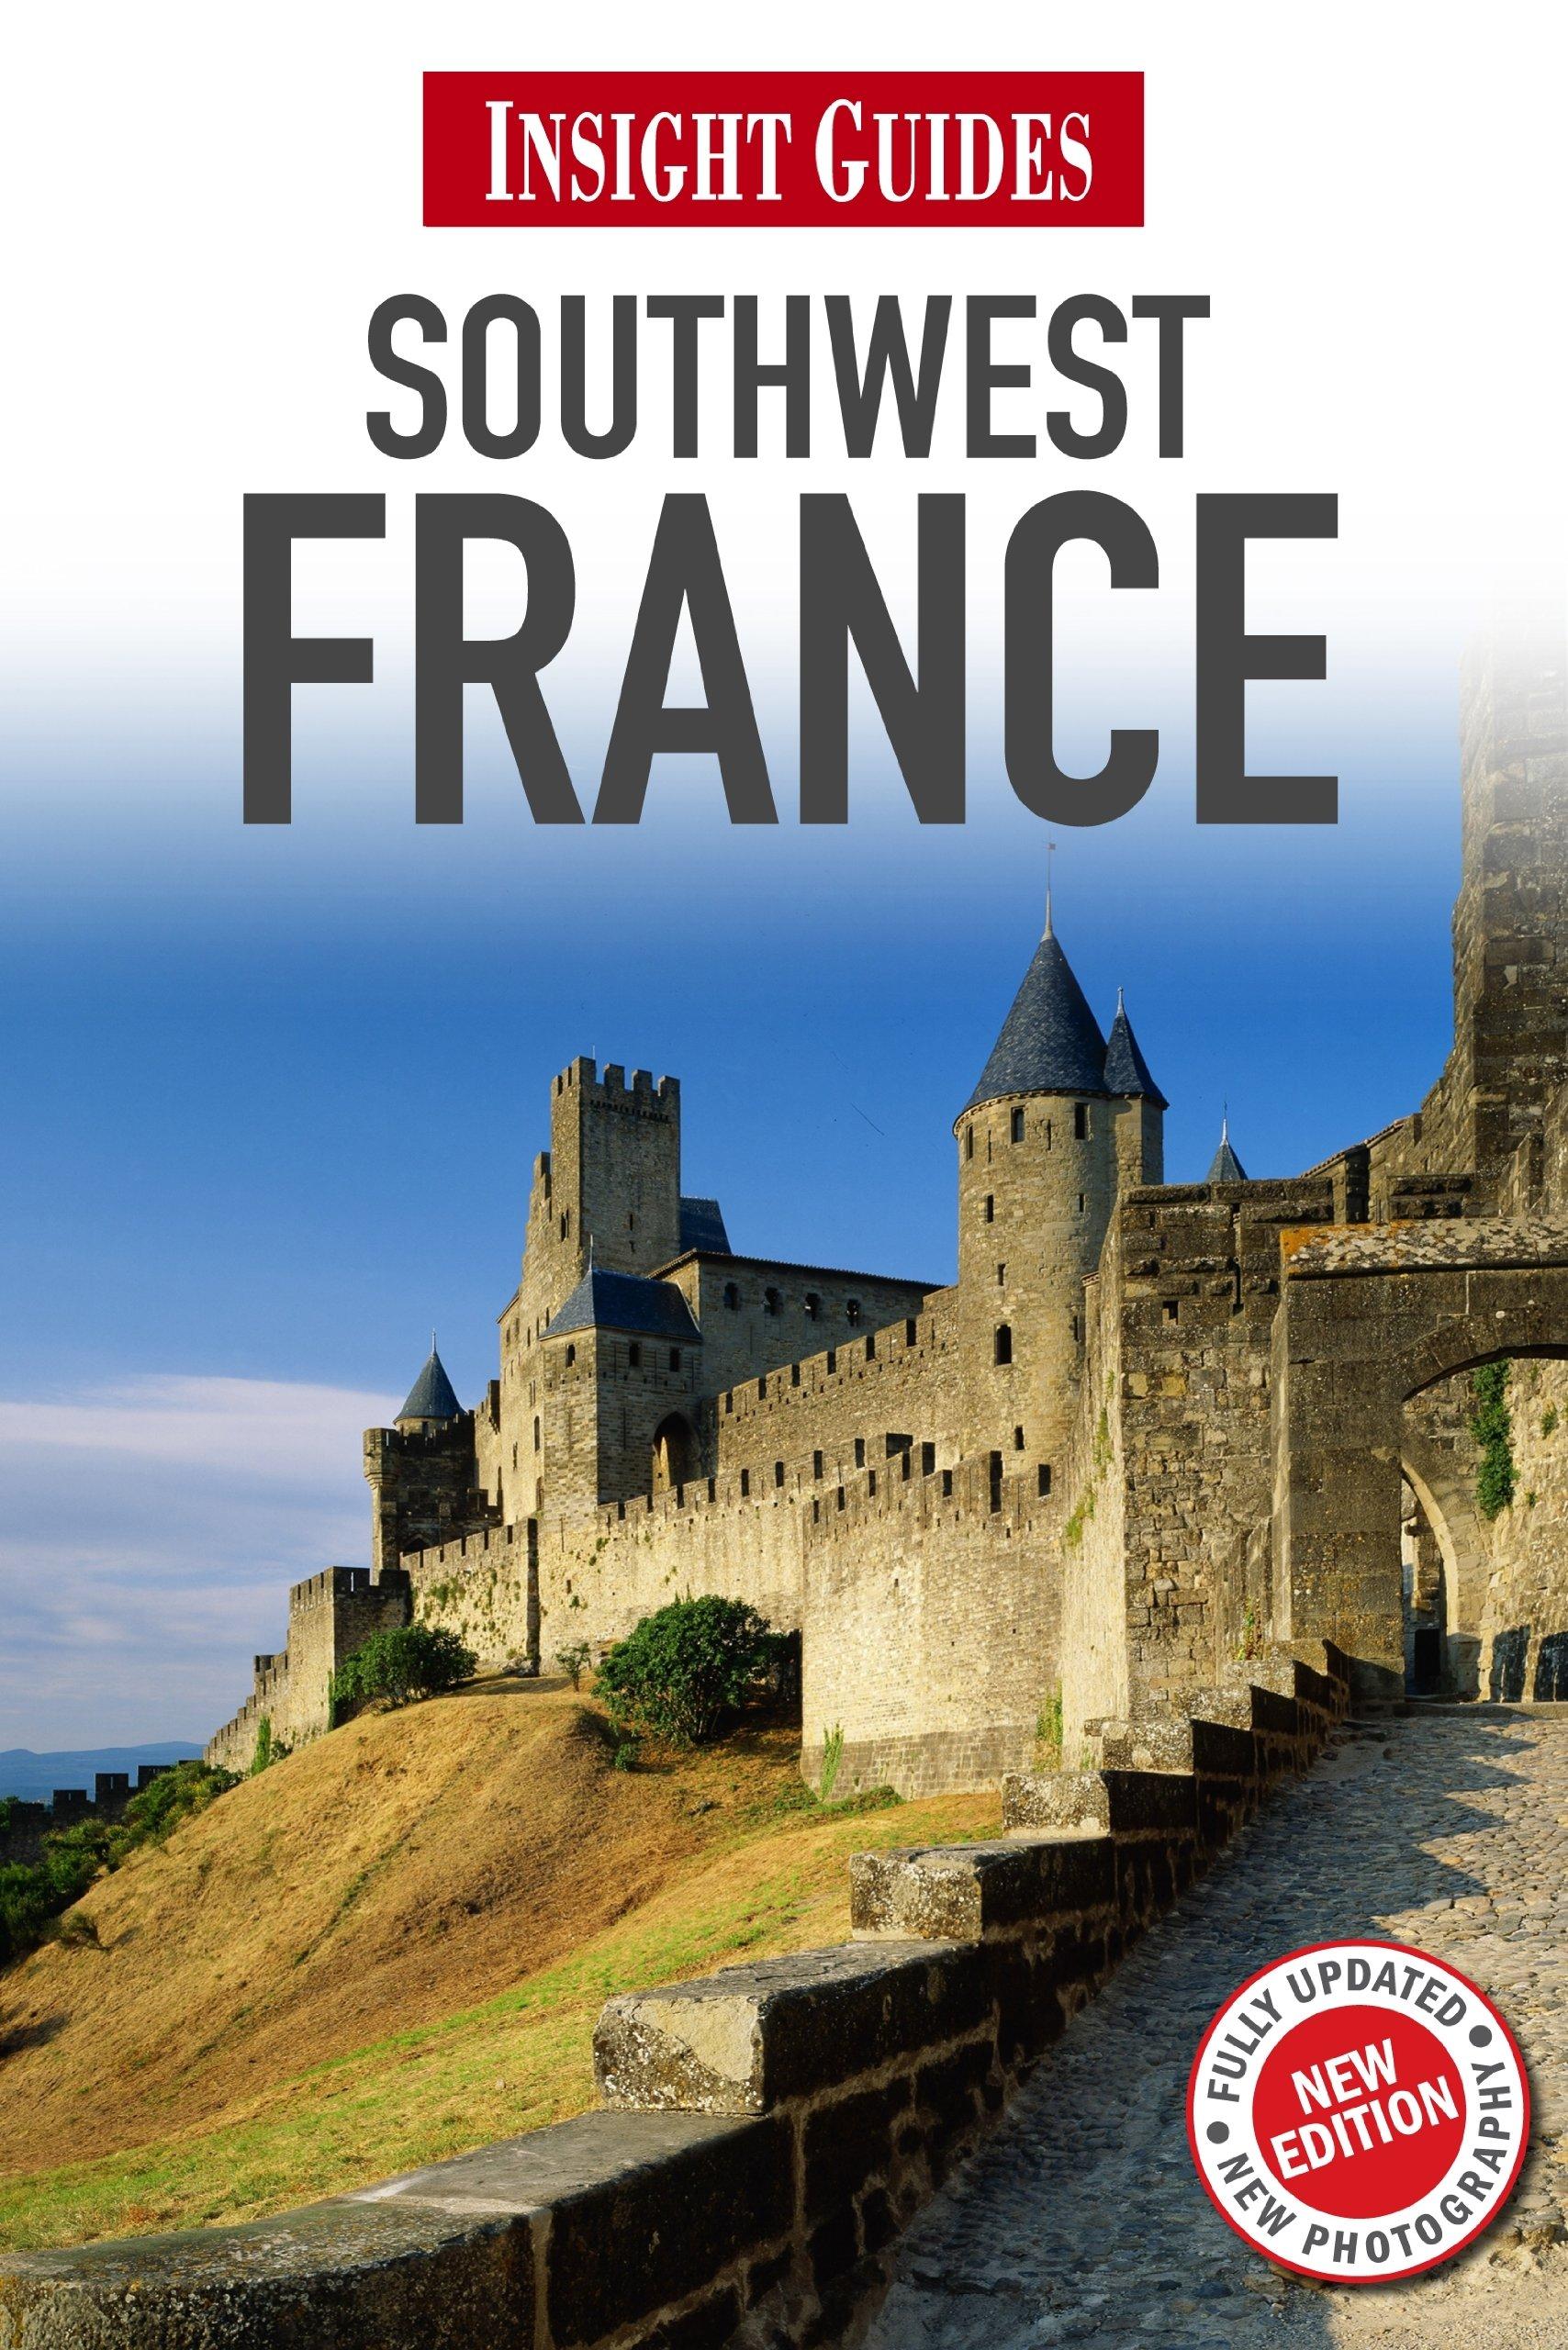 Insight Guides: Southwest France [Idioma Inglés]: Amazon.es: Insight Guides: Libros en idiomas extranjeros